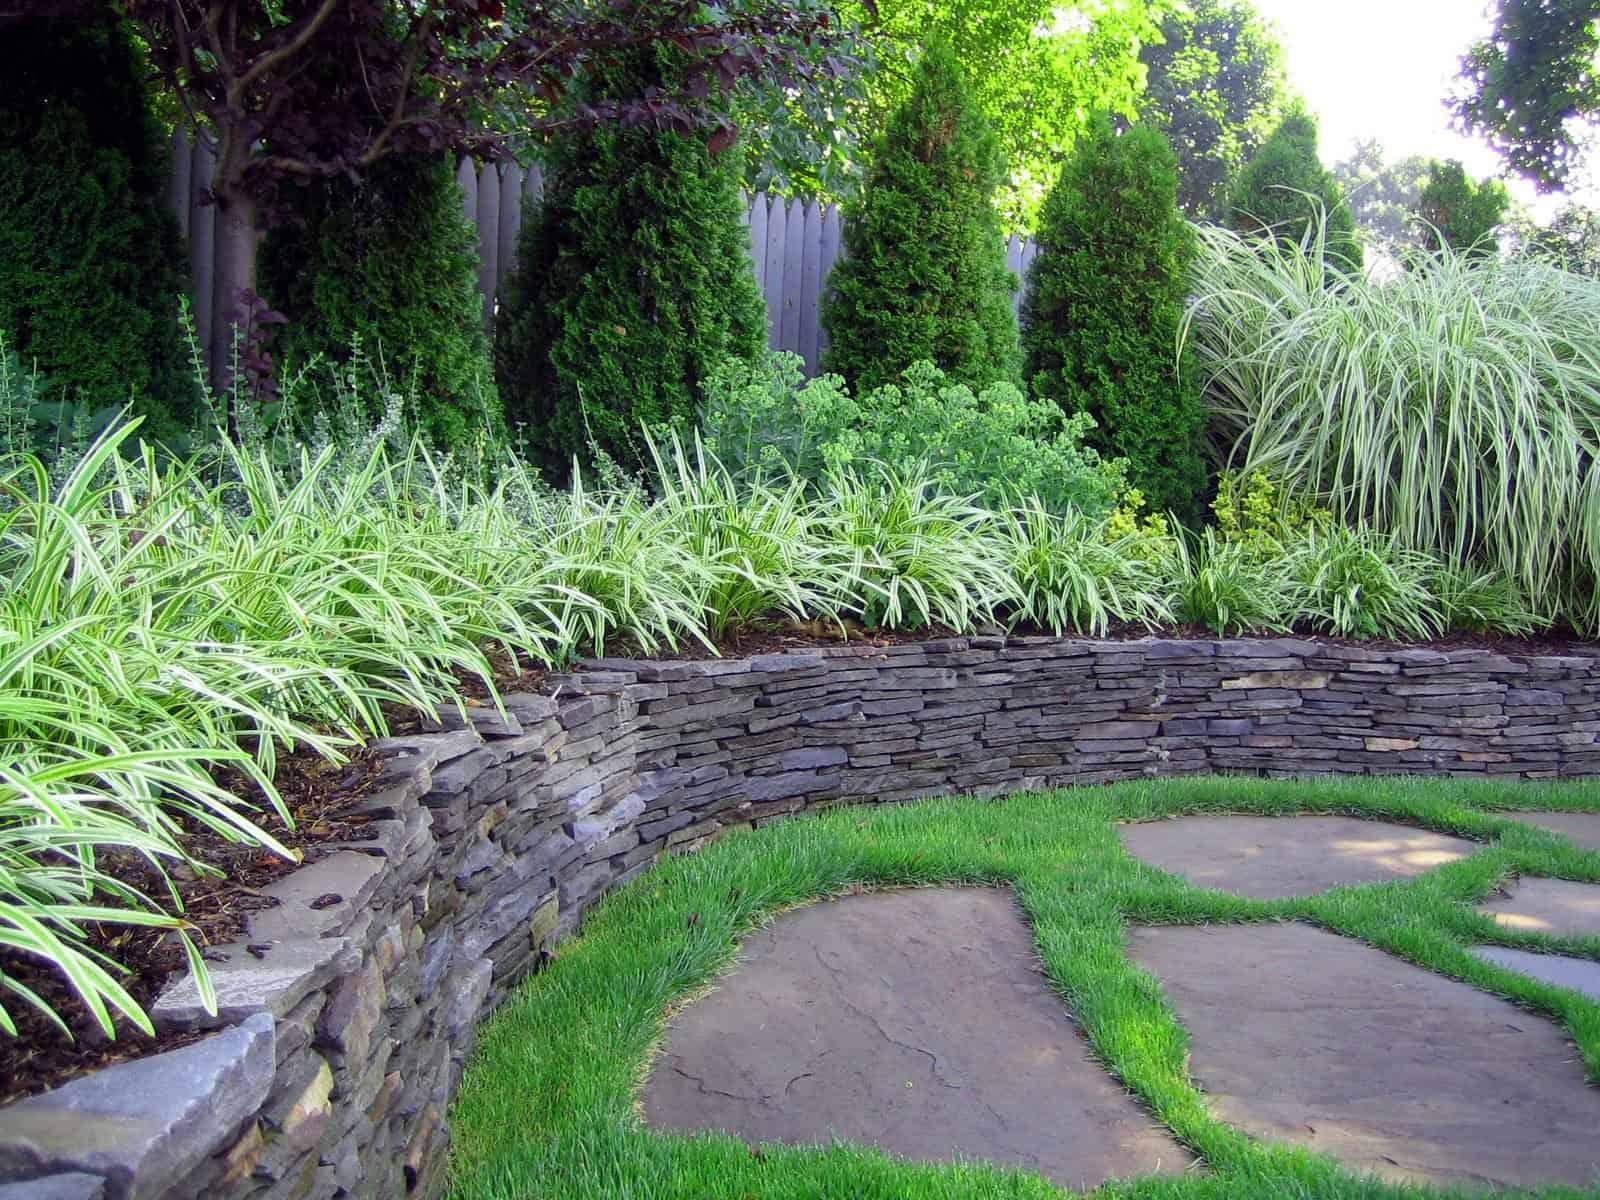 New York State stacked bluestone retaining wall - Dix Hills, Long Island NY